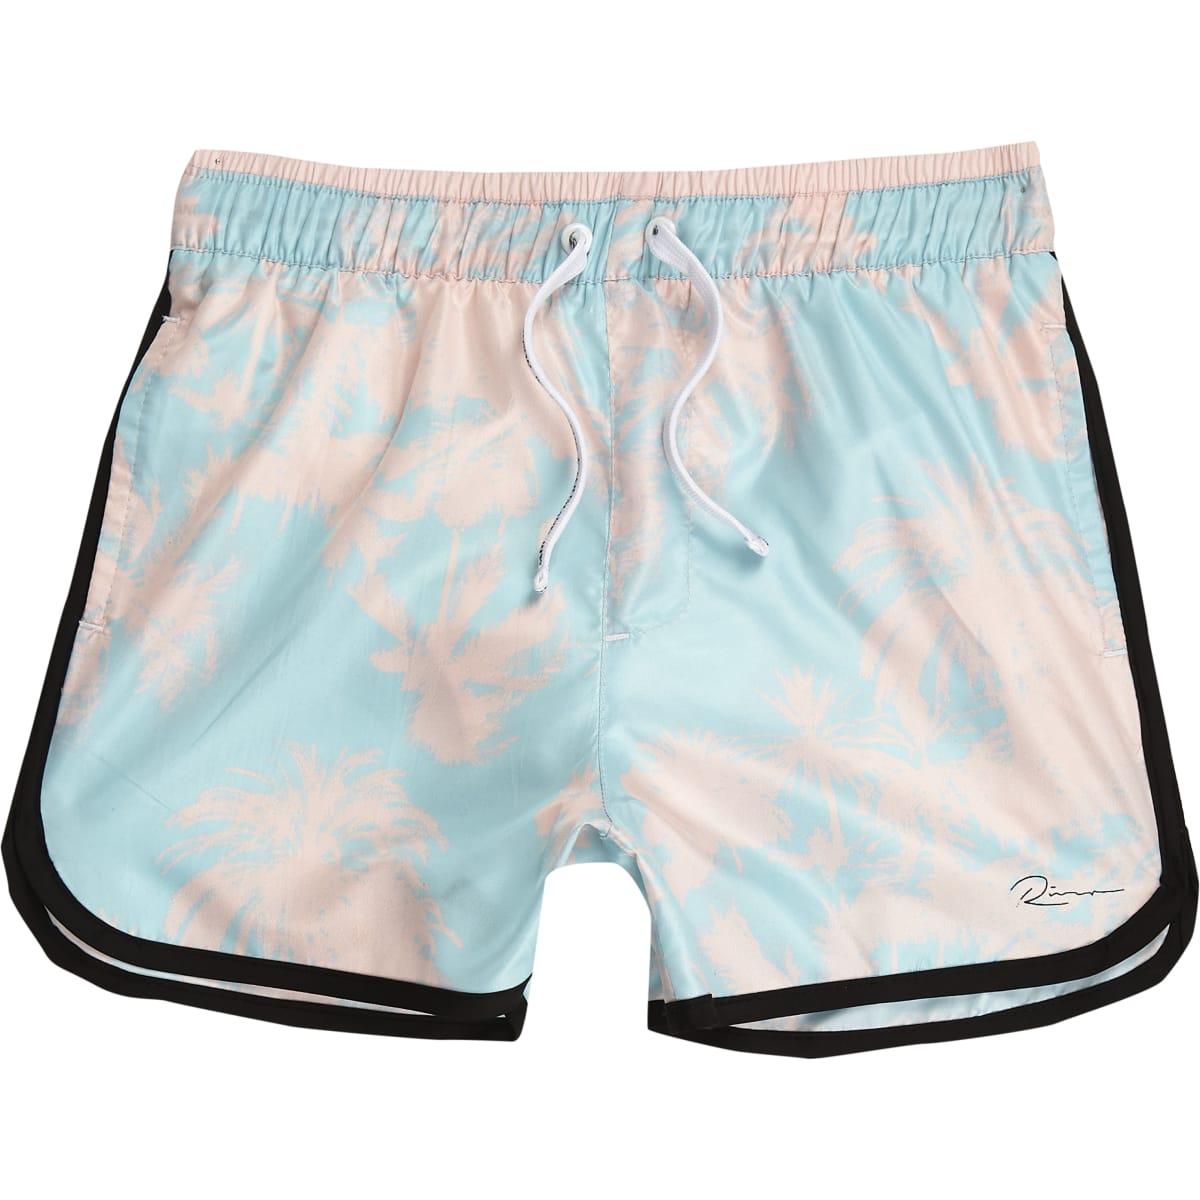 Boys blue palm print swim shorts